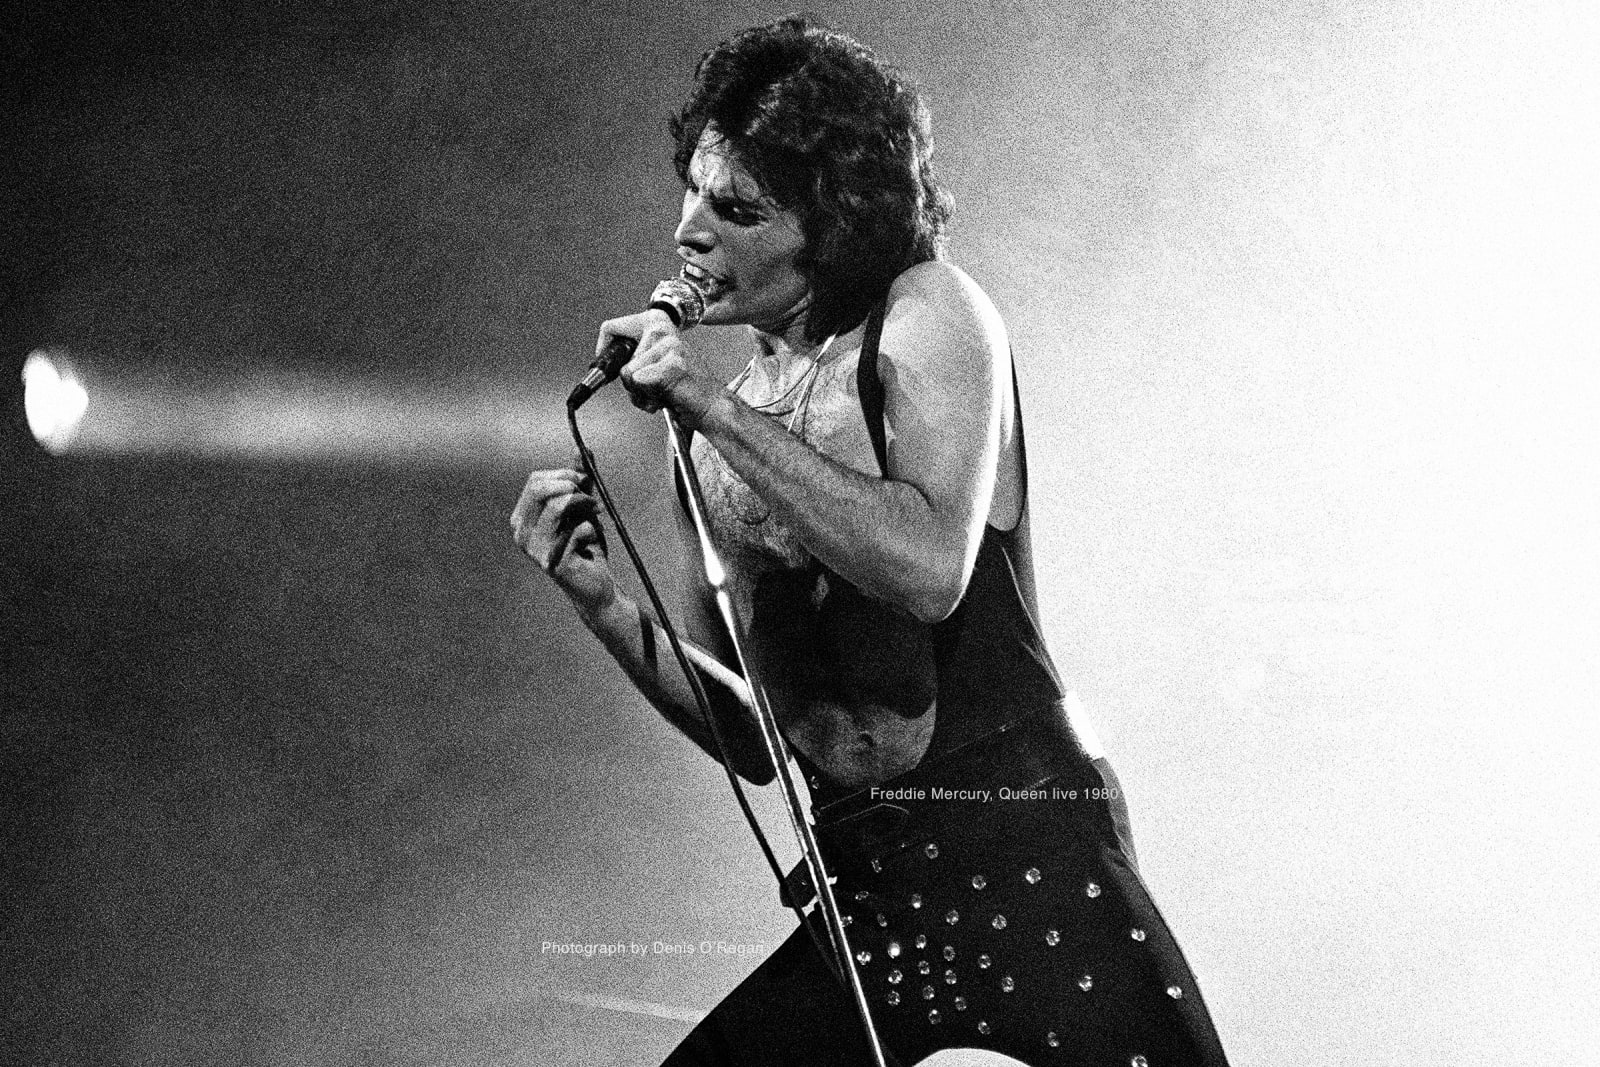 QUEEN, Freddie Mercury Live, 1980